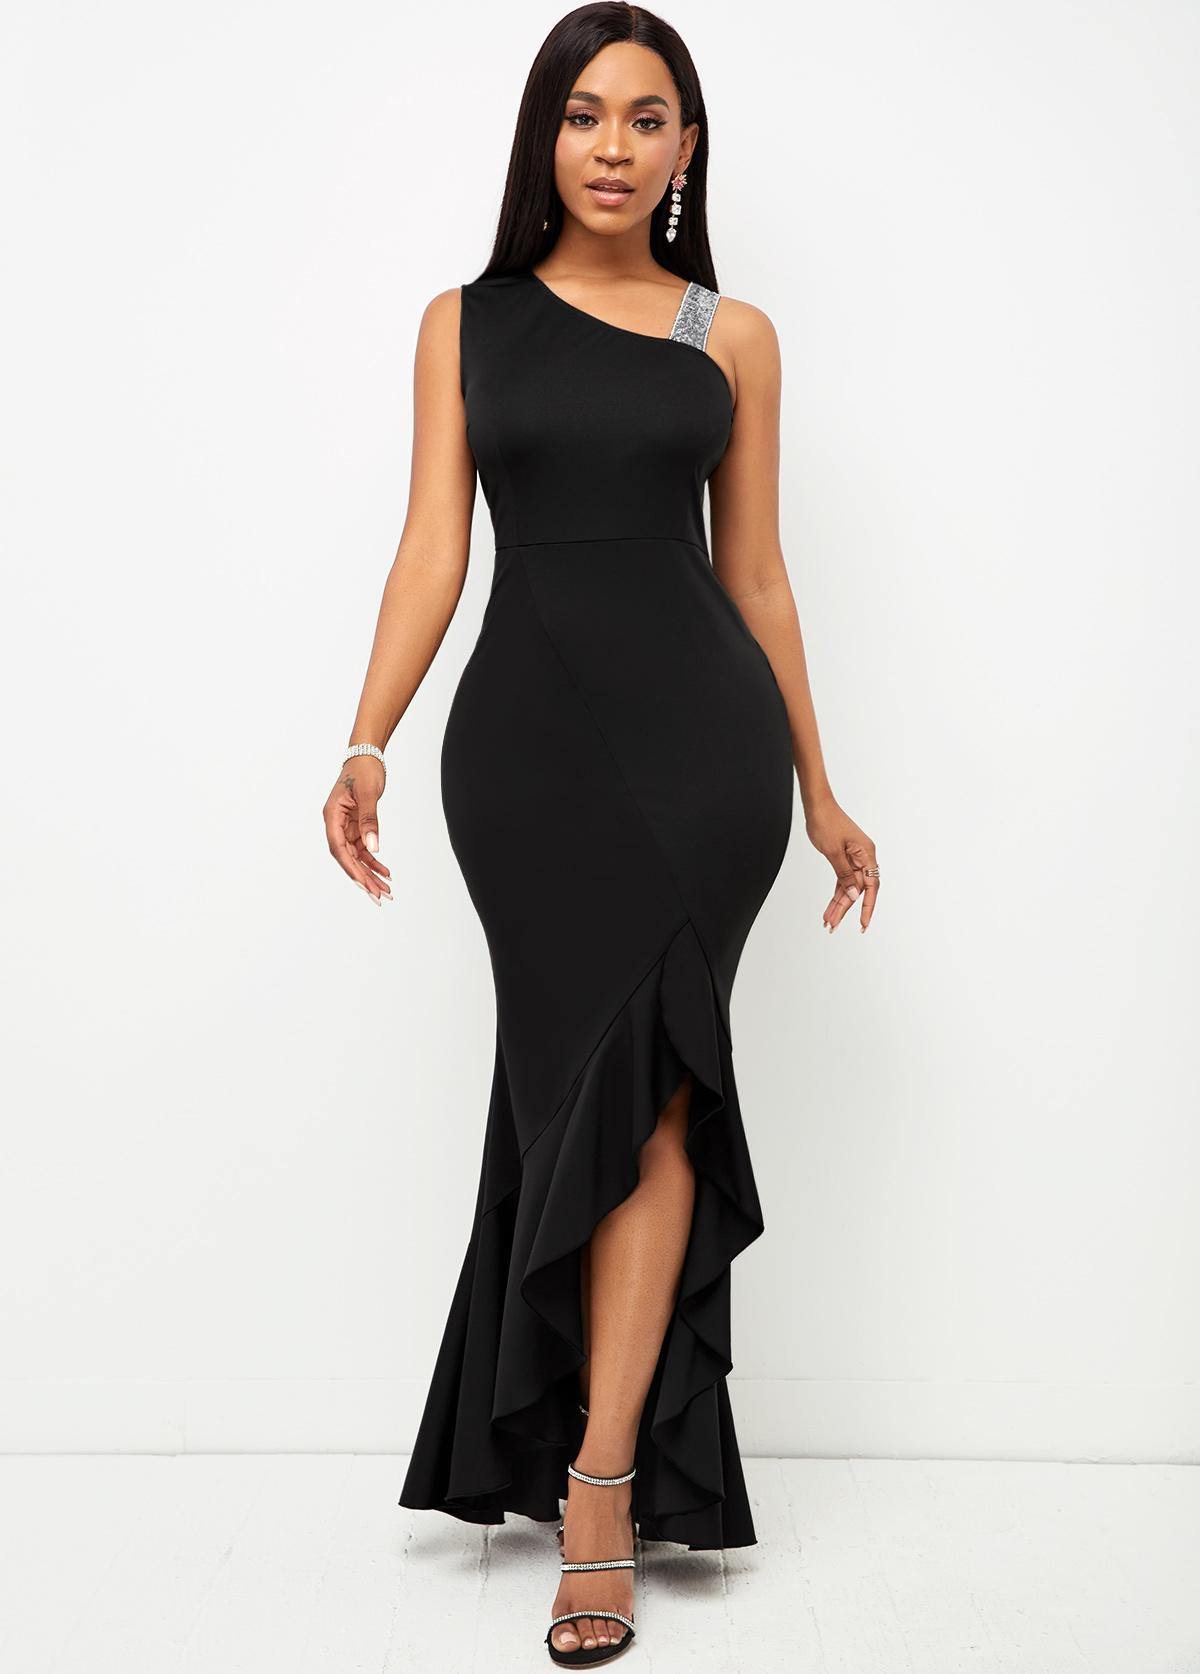 Sequin Contrast Sleeveless Mermaid Hem Maxi Dress